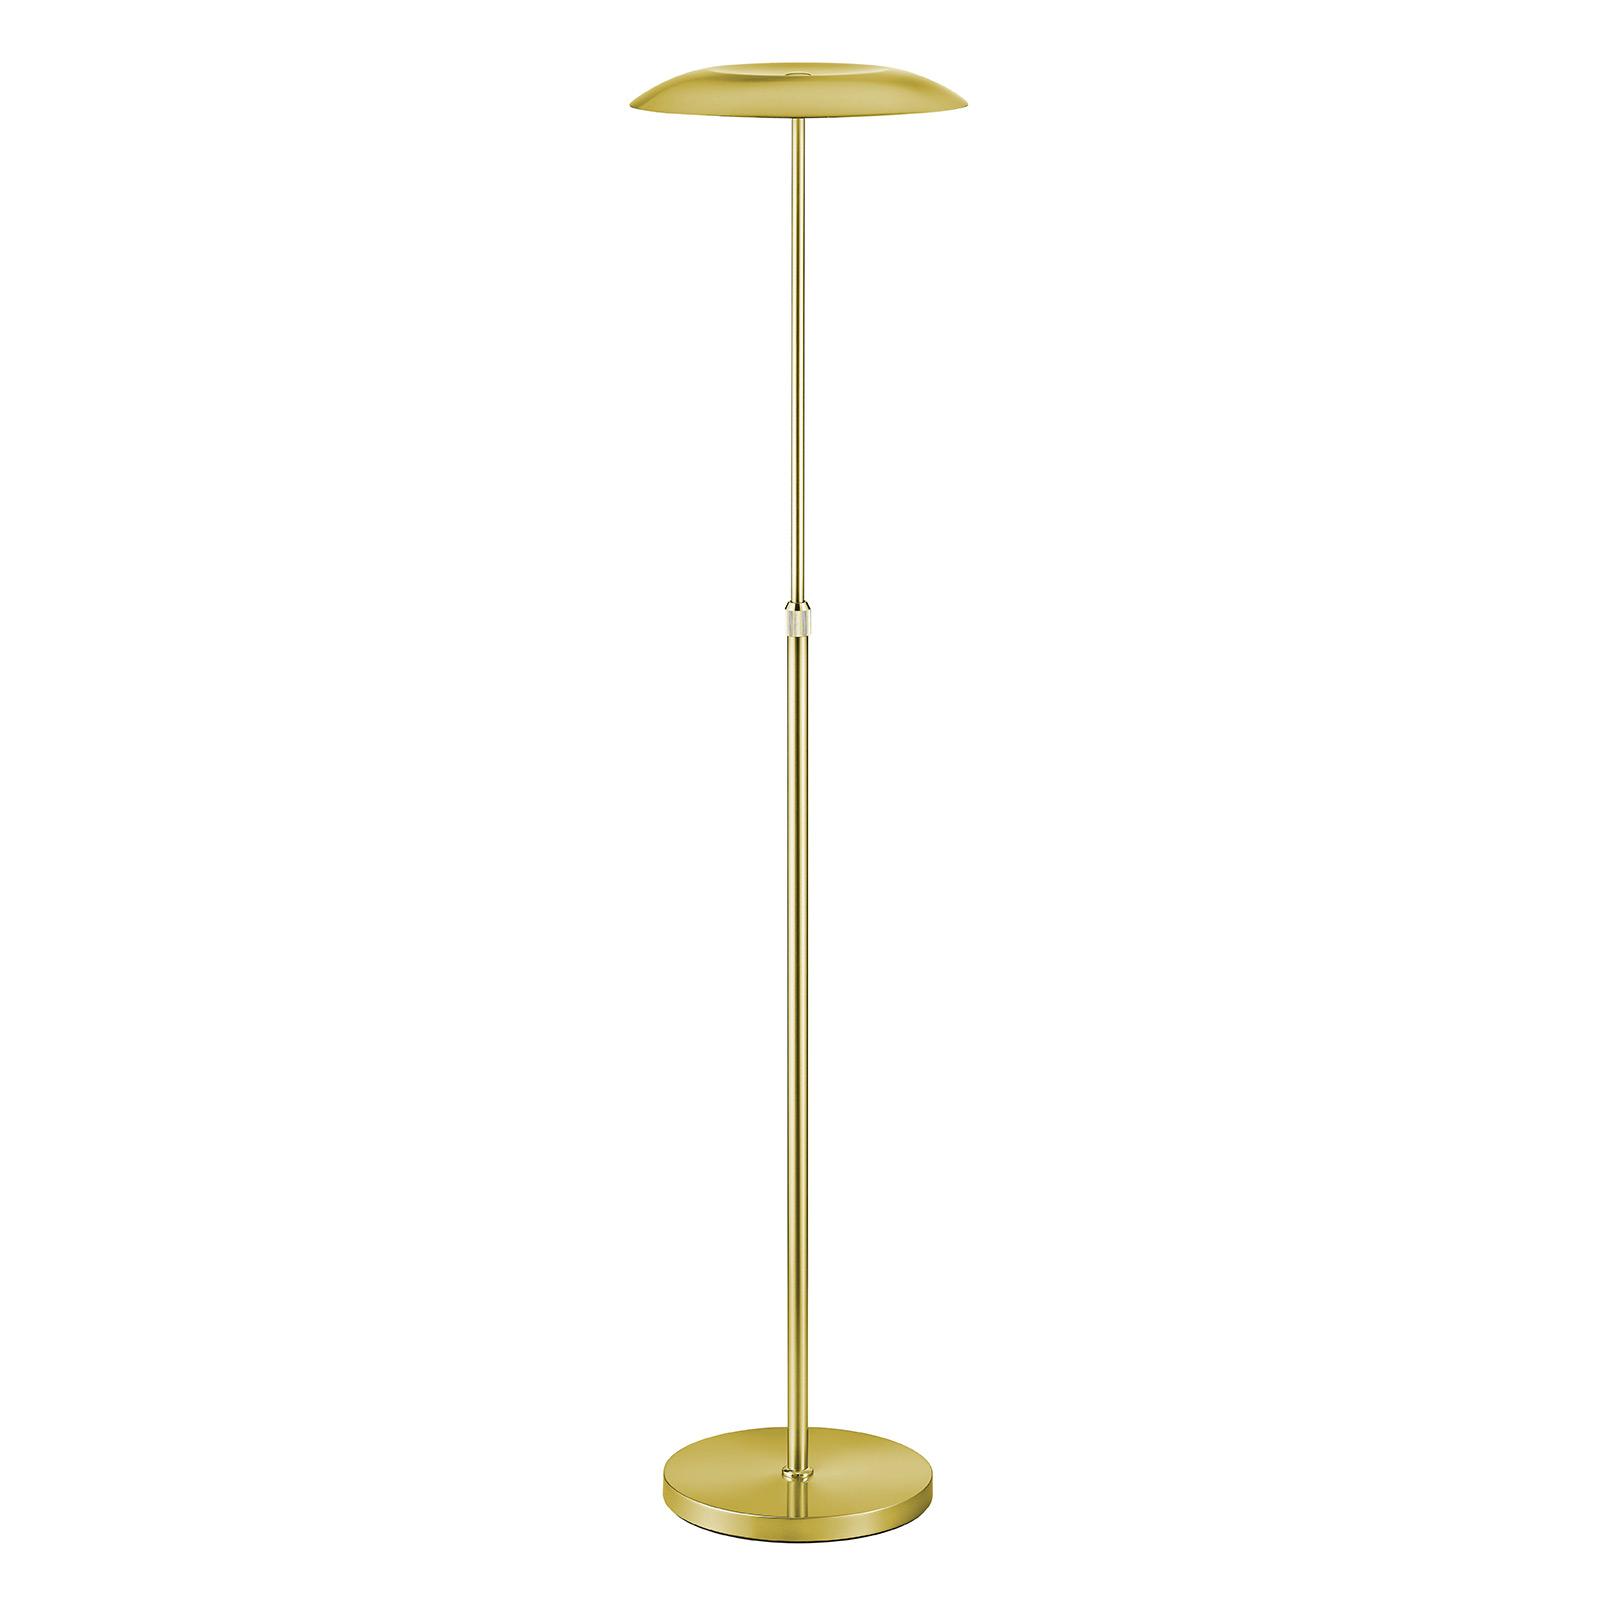 B-Leuchten Curling lampa stojąca LED mosiądz